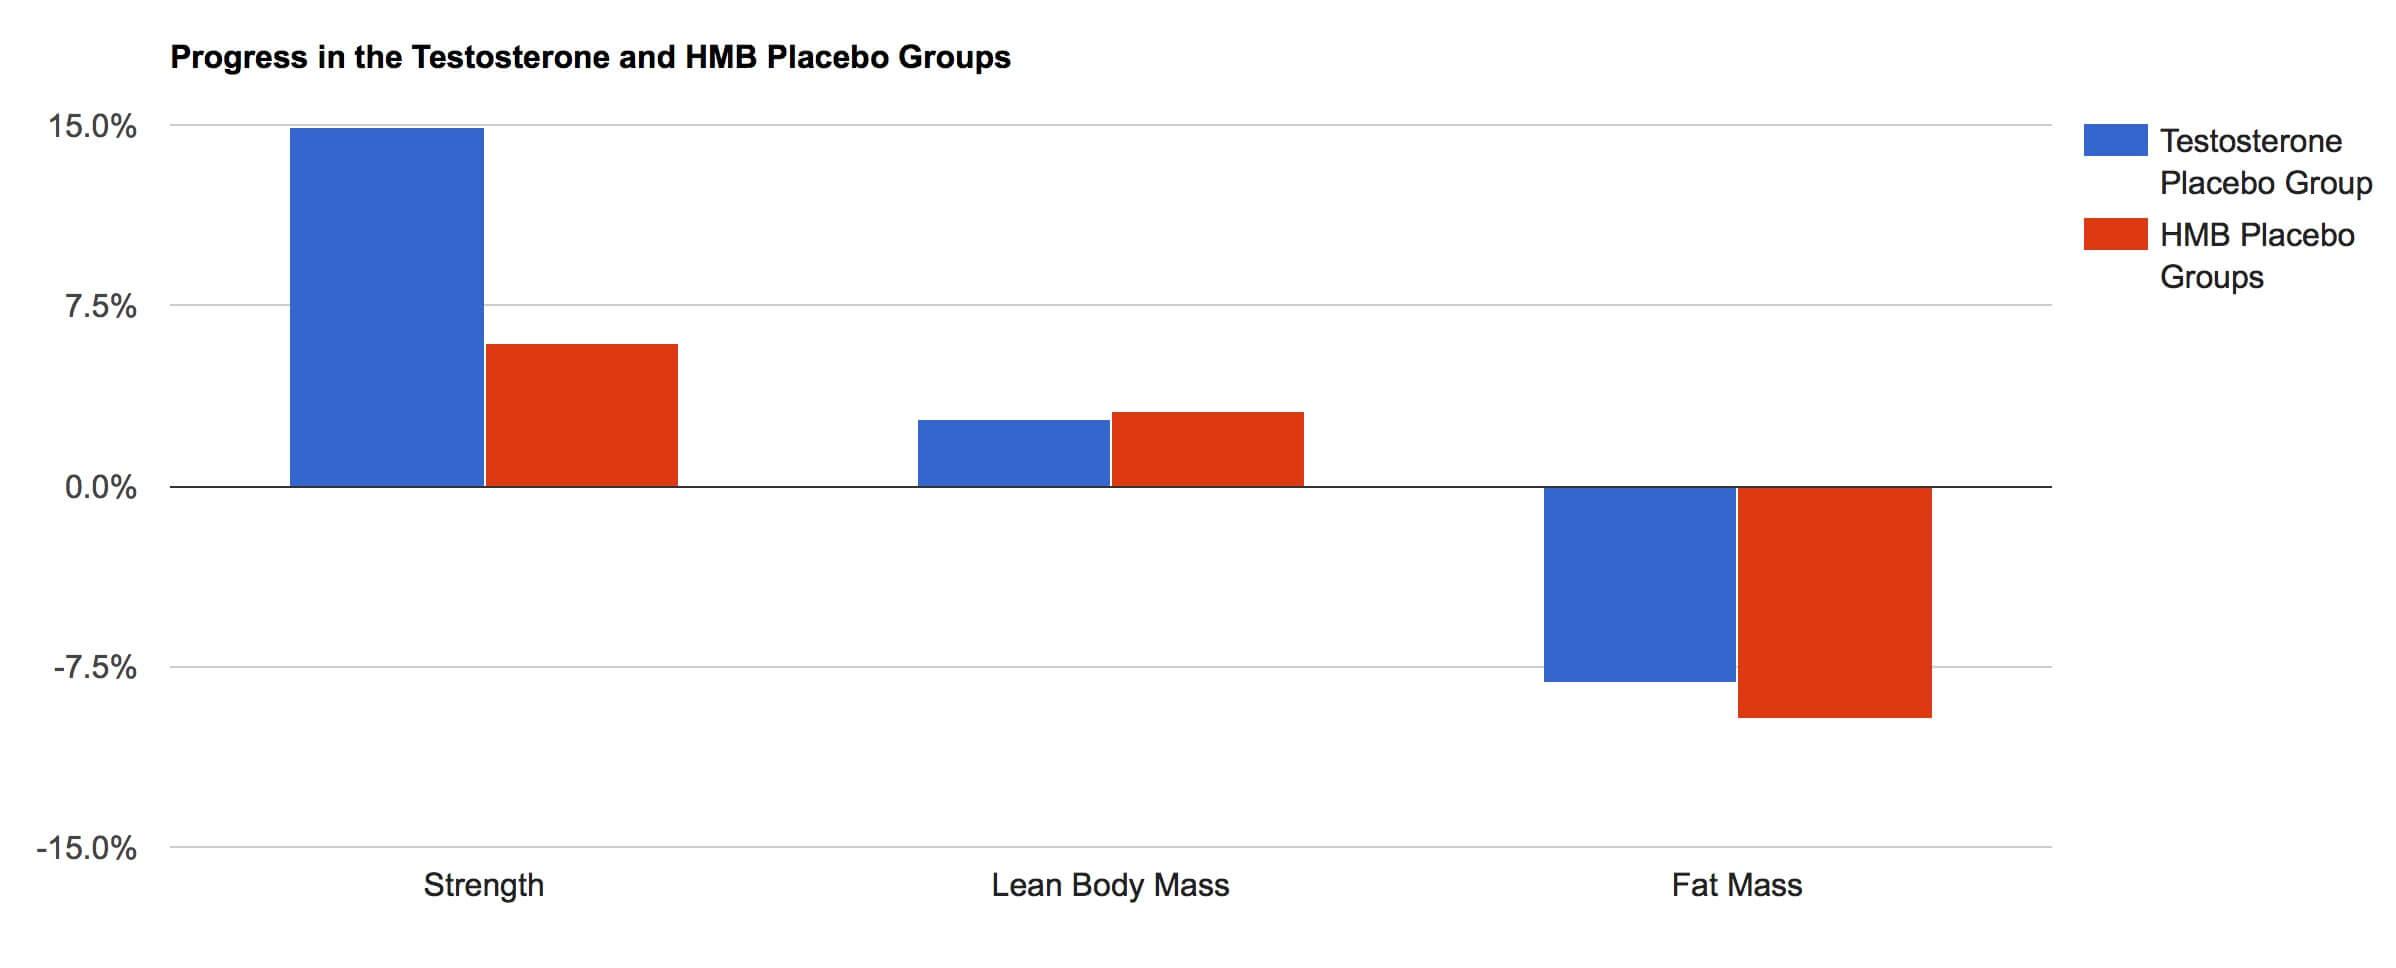 HMB vs. Testosterone Placebo Groups